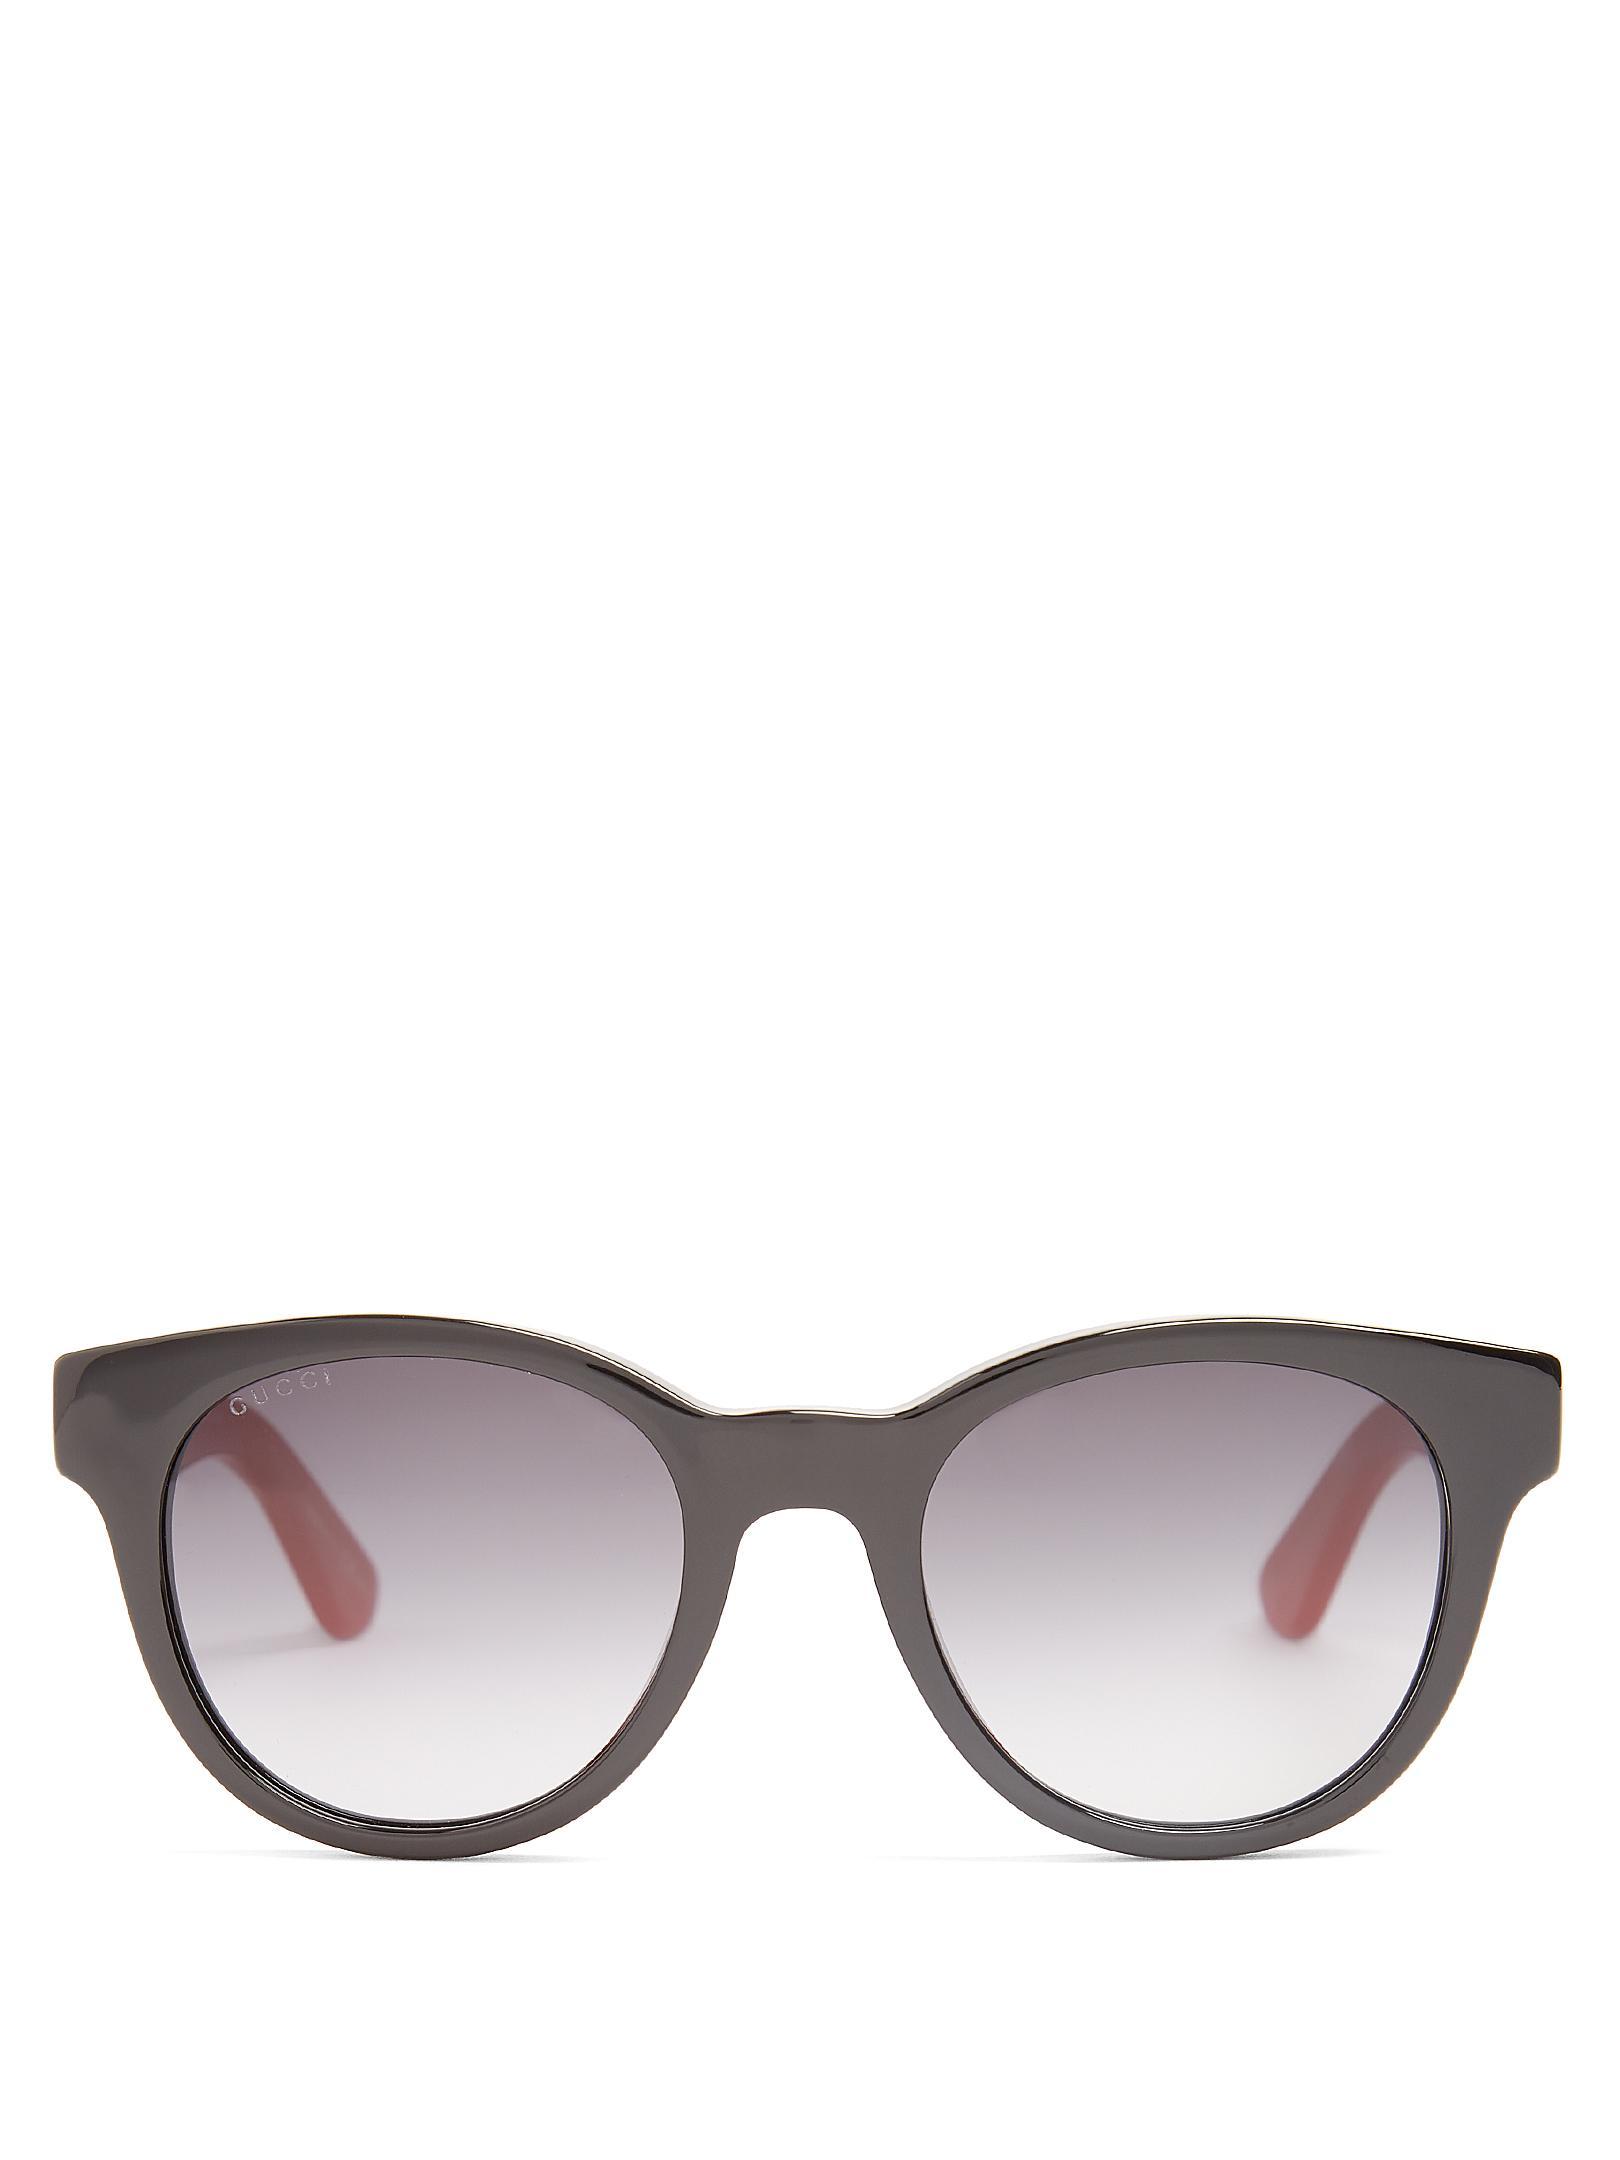 ef3756b5cc3 Gucci Round-frame Acetate Sunglasses Mens